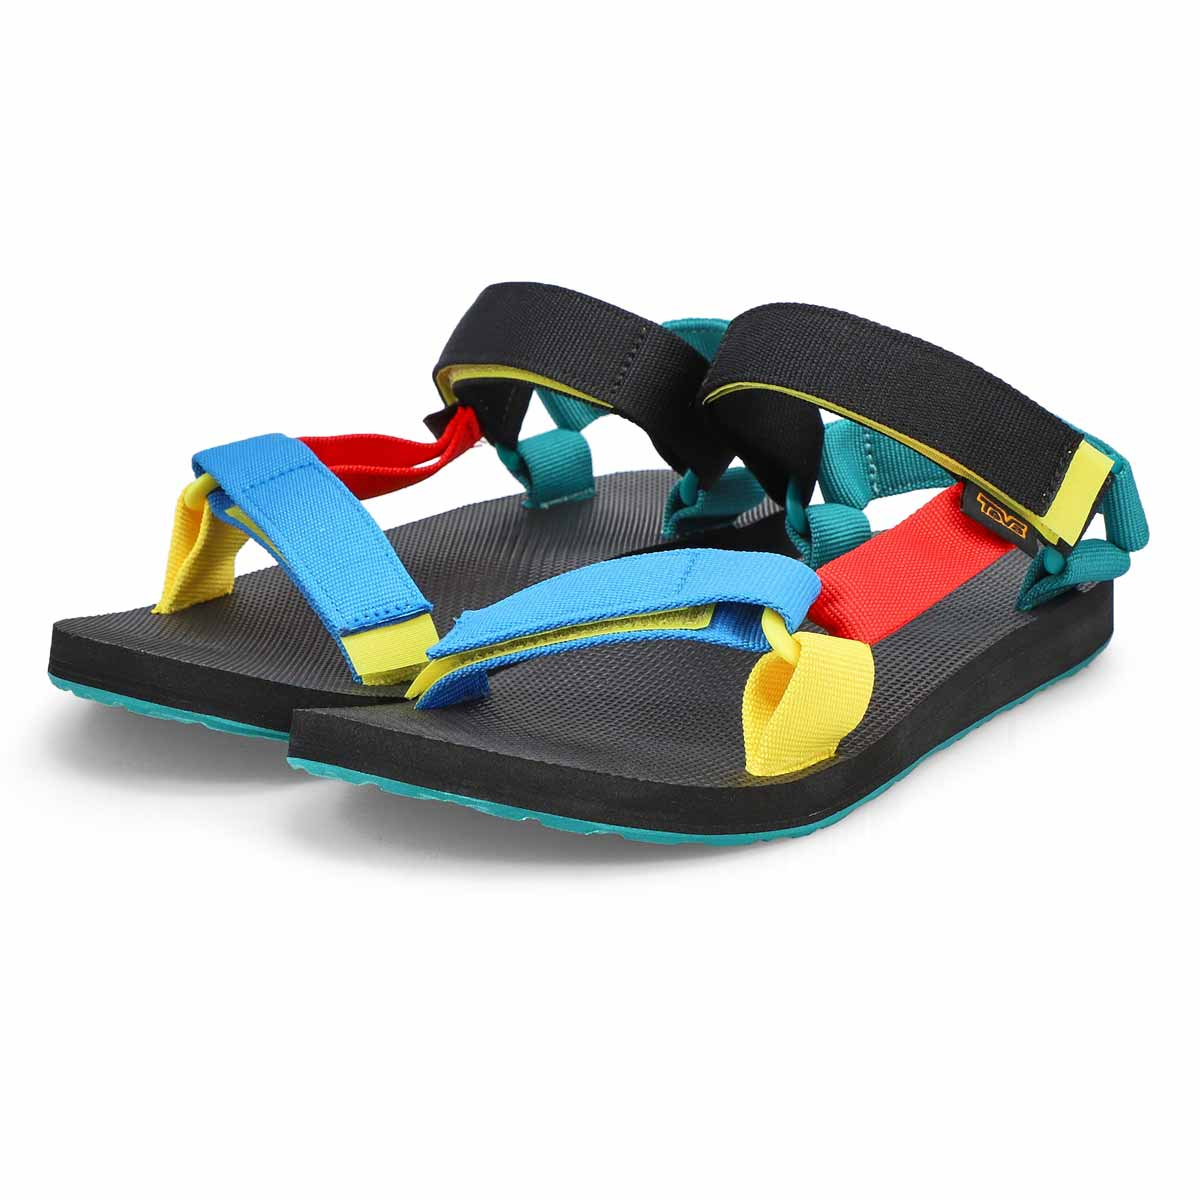 Sandale sport Original Universal, multi, homme